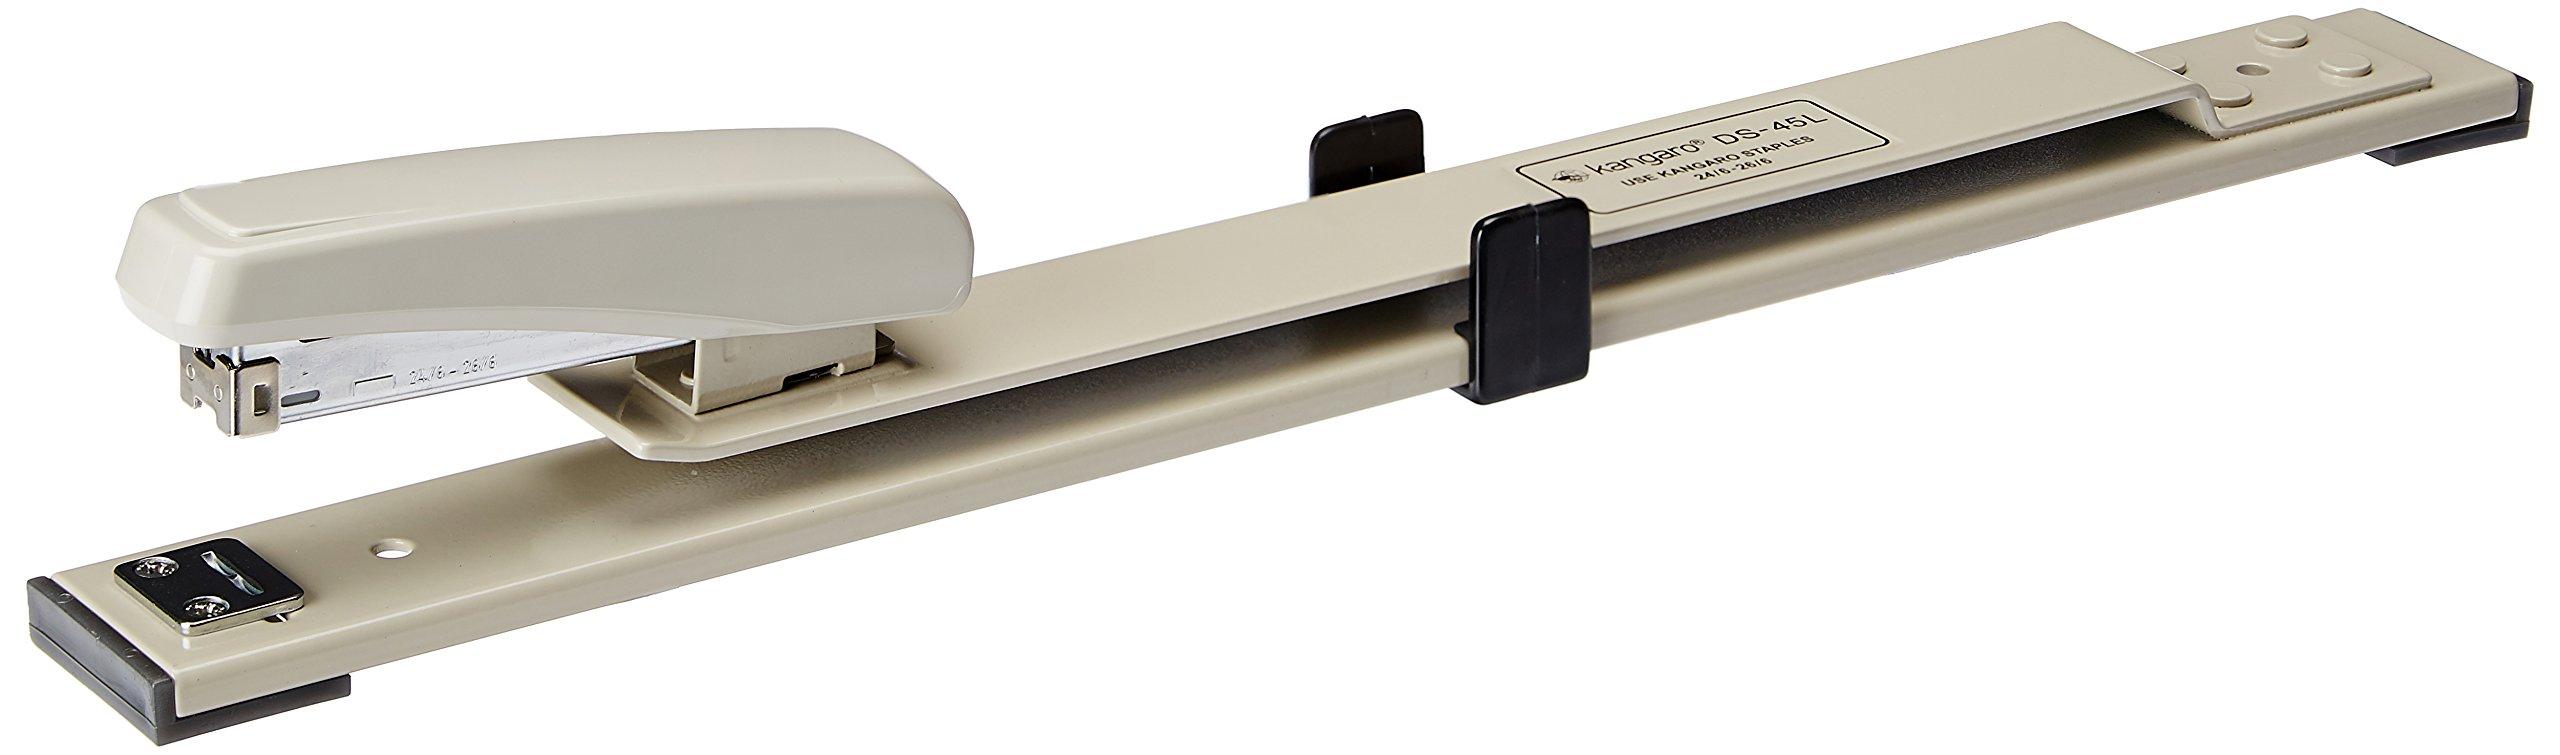 Kangaro DS-45L Stapler product image